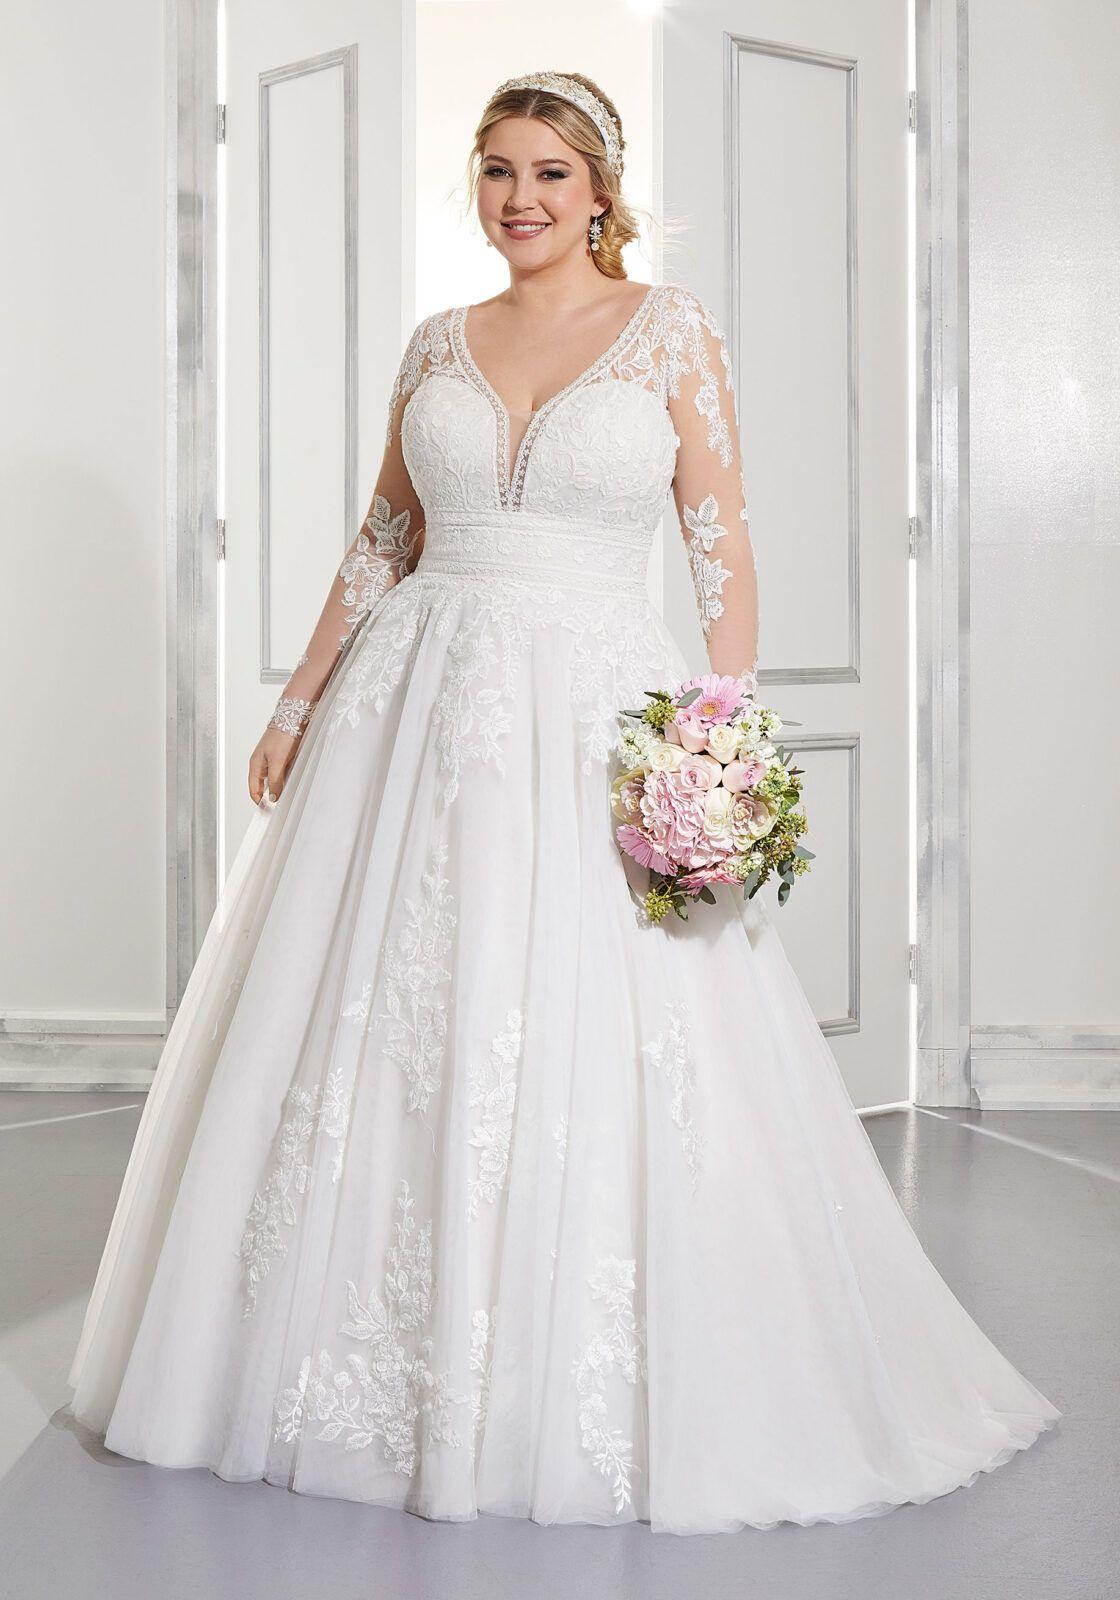 Ama Wedding Dress Morilee Plus Size Wedding Gowns Plus Wedding Dresses Wedding Dress Inspiration [ 1600 x 1120 Pixel ]